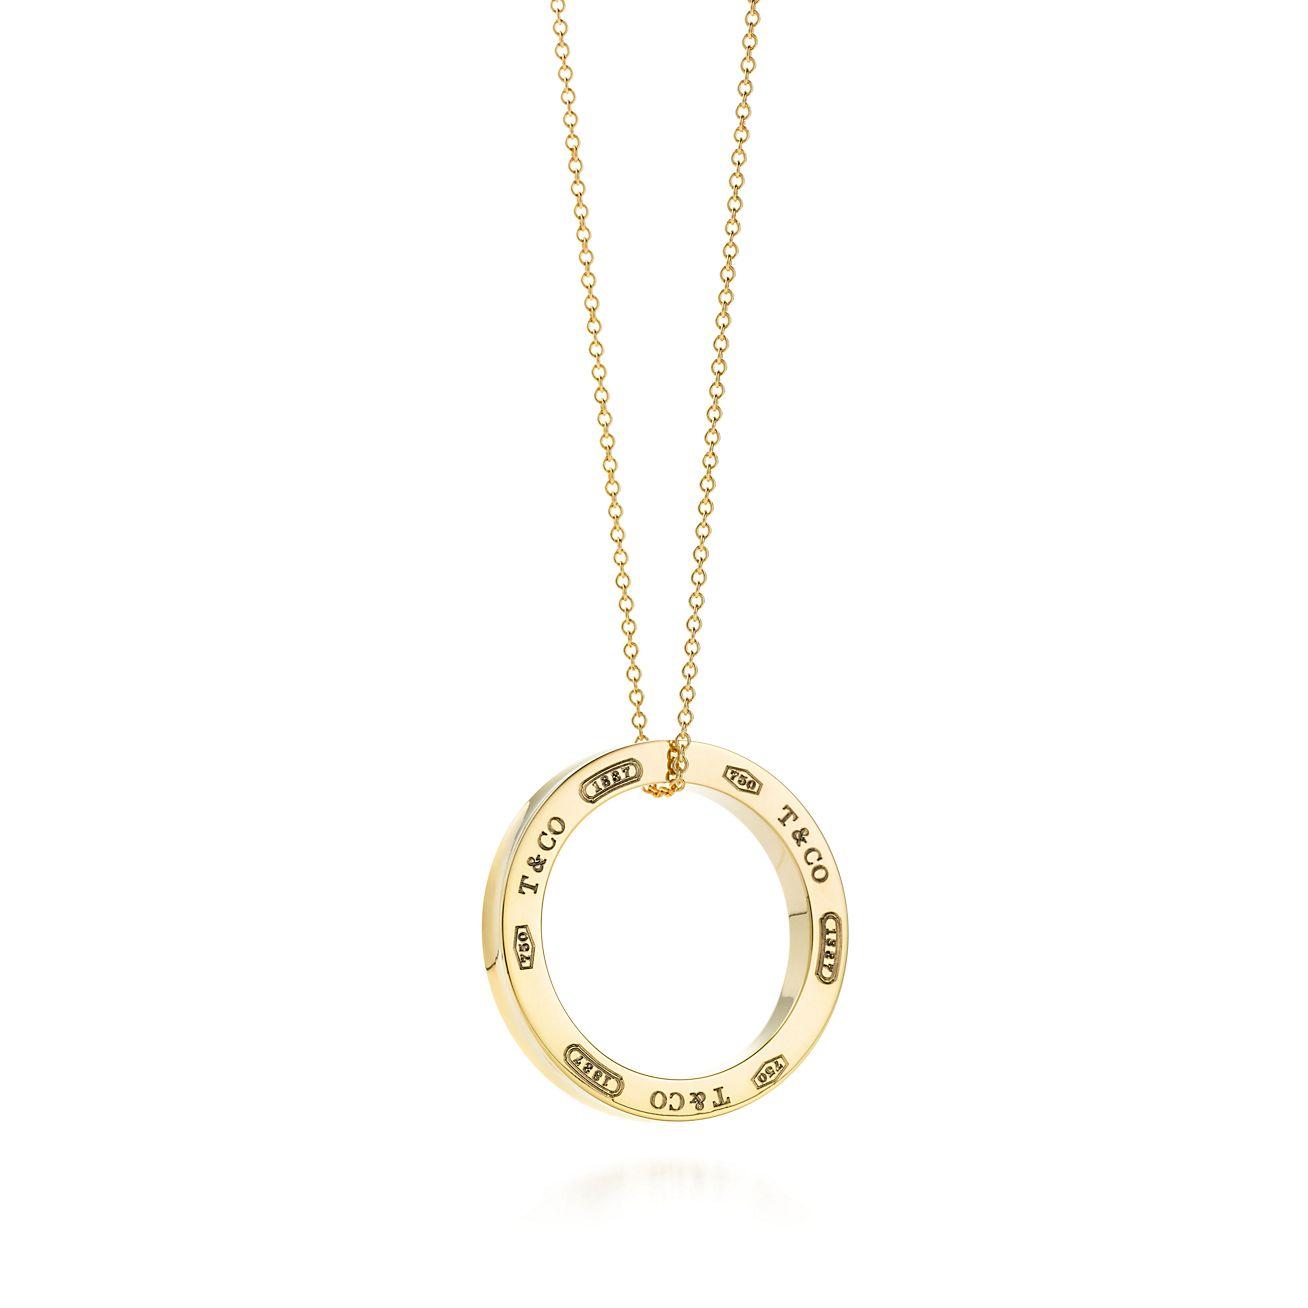 1837 174 circle pendant in 18k gold large